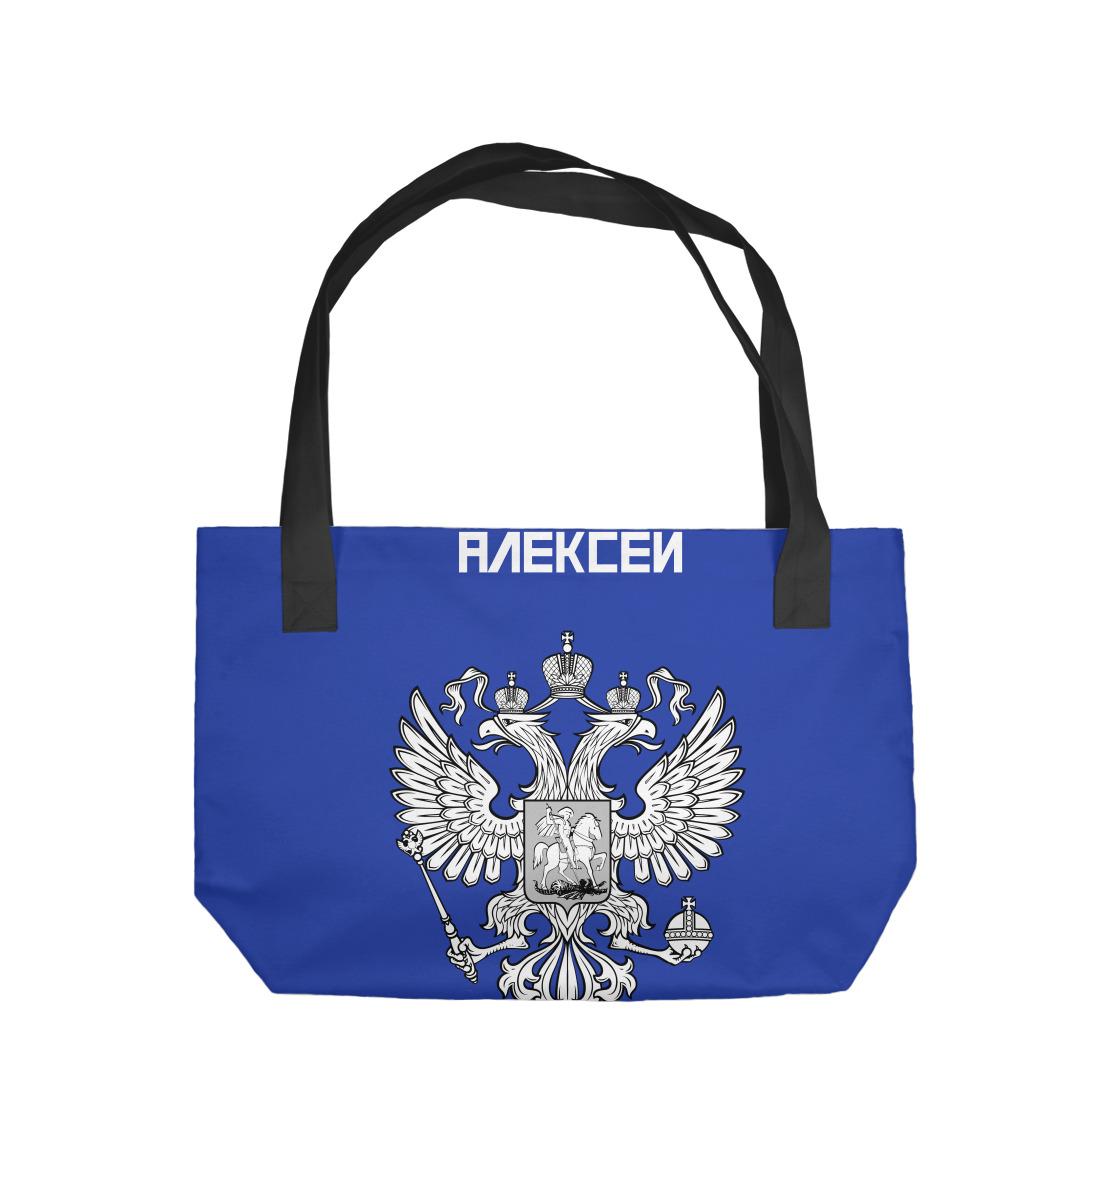 жора sport russia collection АЛЕКСЕЙ sport russia collection